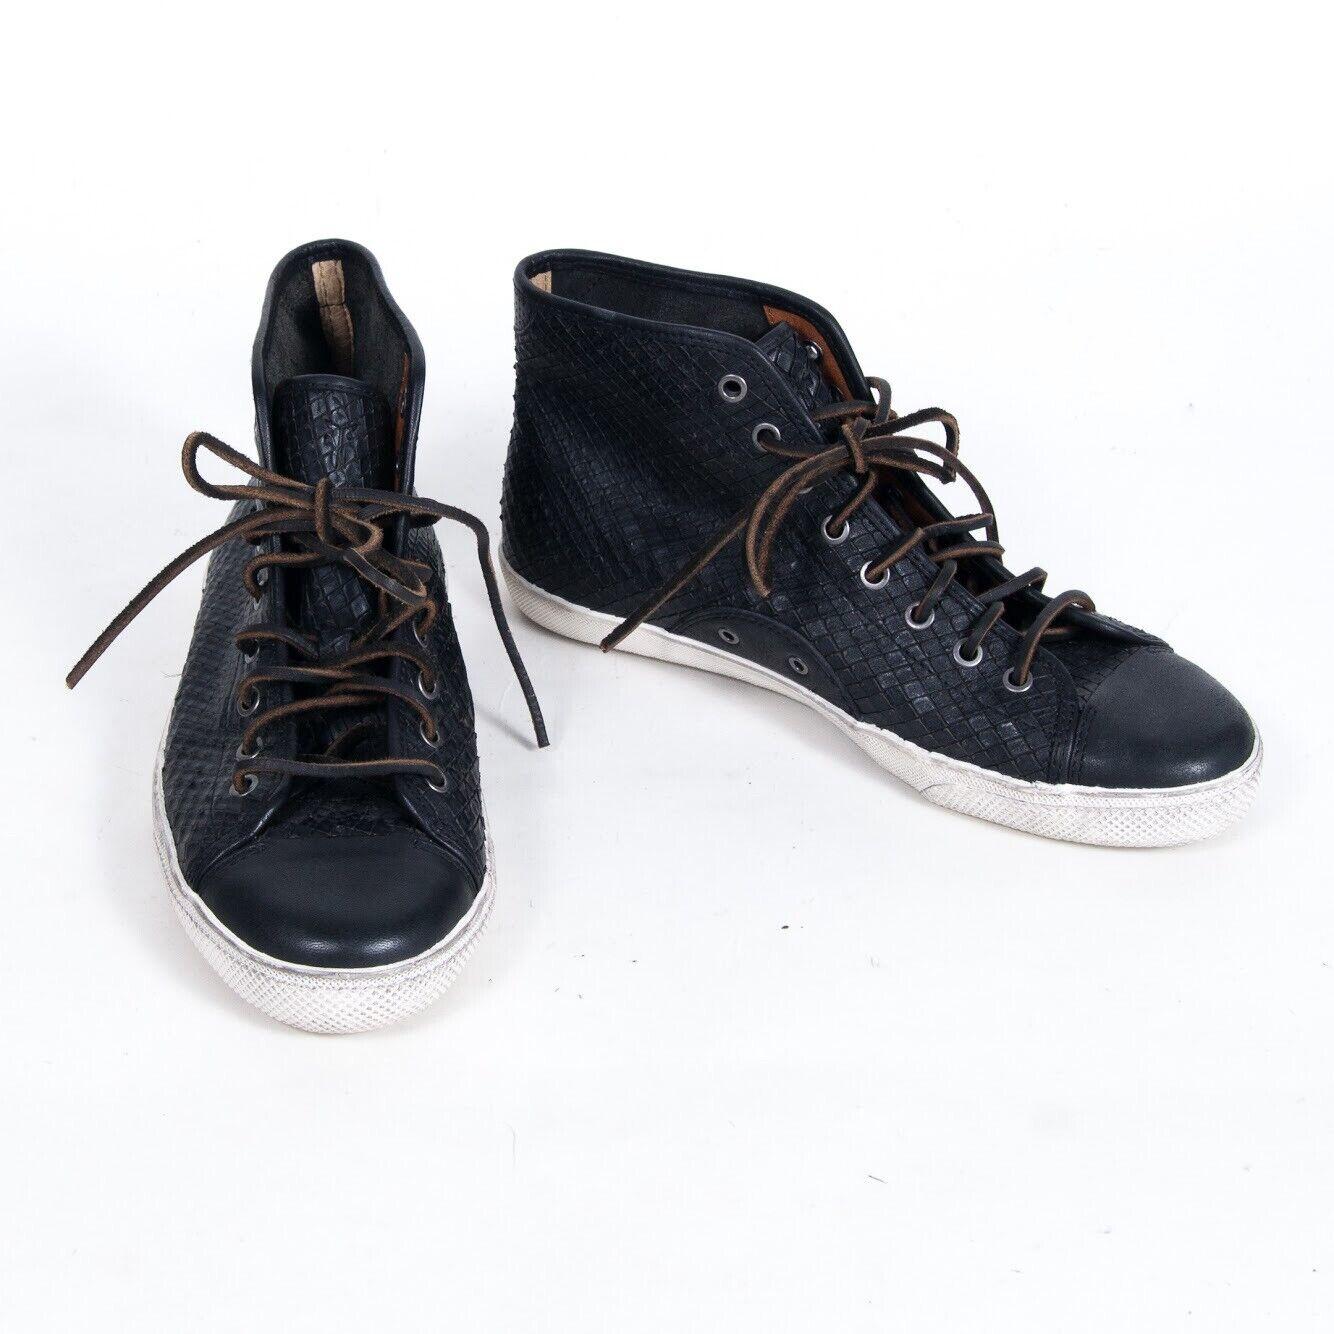 NWOB FRYE men's high top sneakers, unworn, size was 8.5, all leather